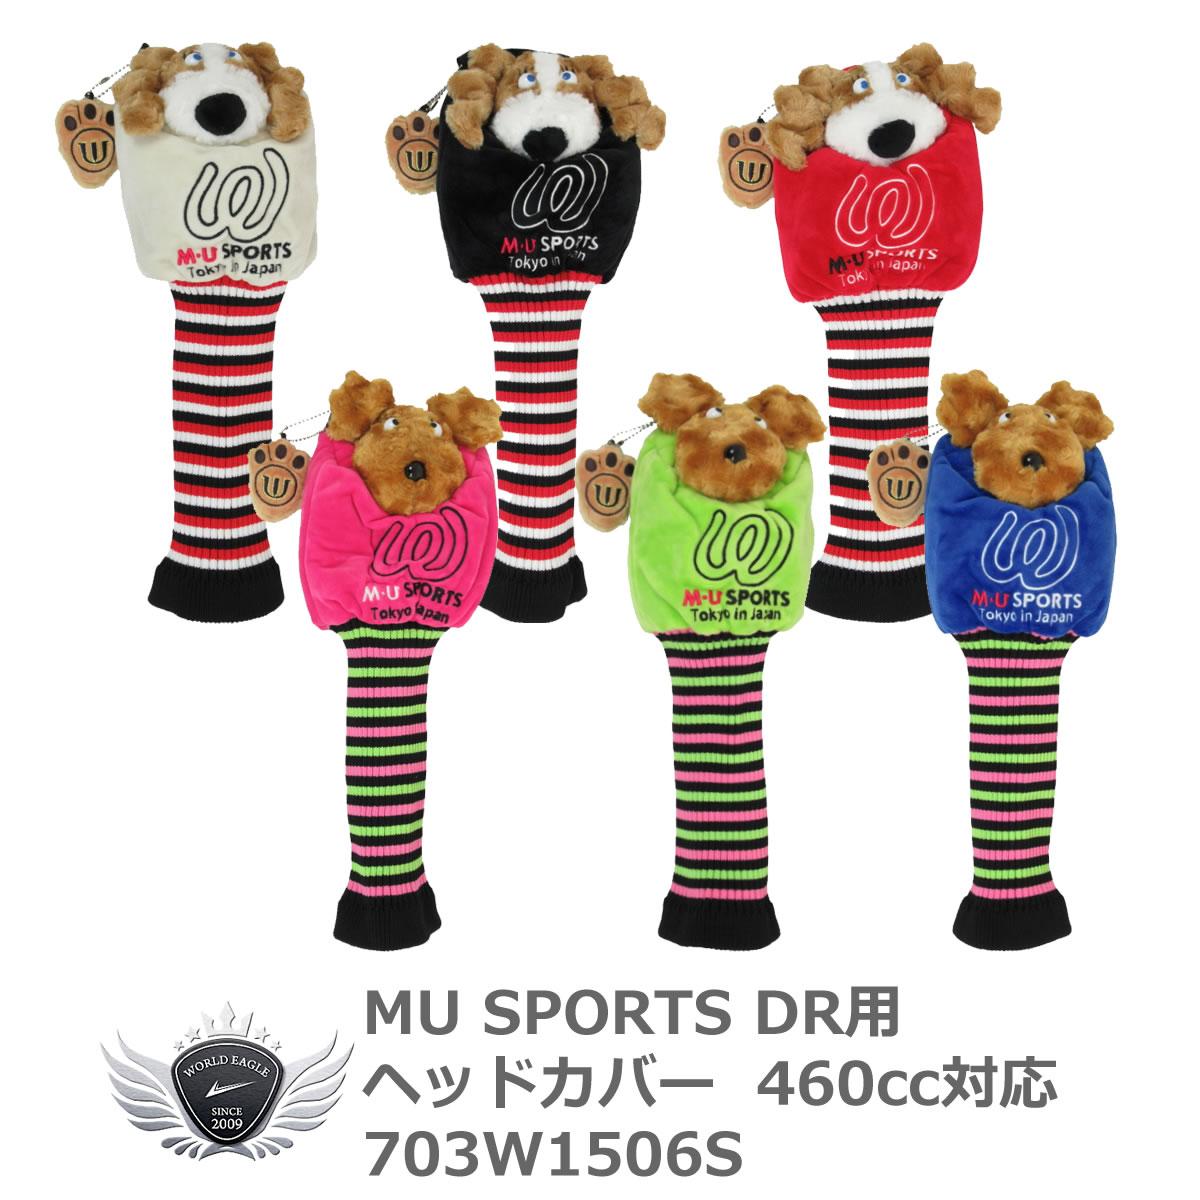 MU SPORTS エムユースポーツ ドライバー用ヘッドカバー 460cc対応 703W1506S 犬 かわいい【あす楽】